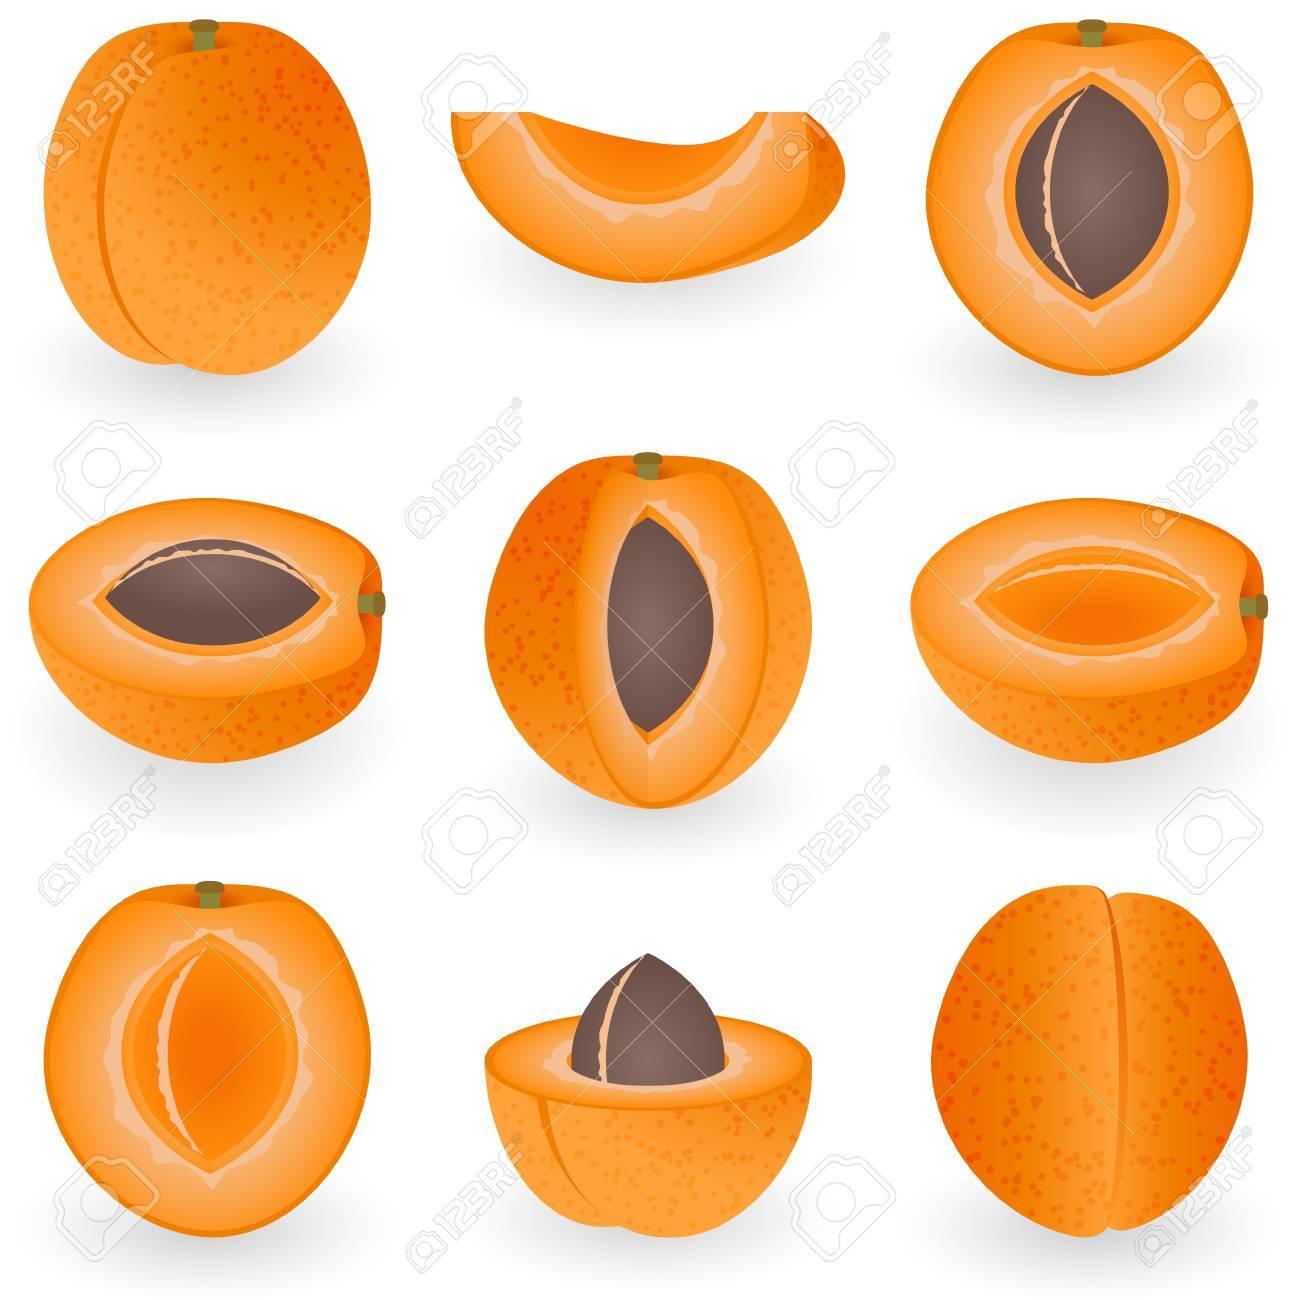 Icon Set Apricot Stock Vector - 21448847